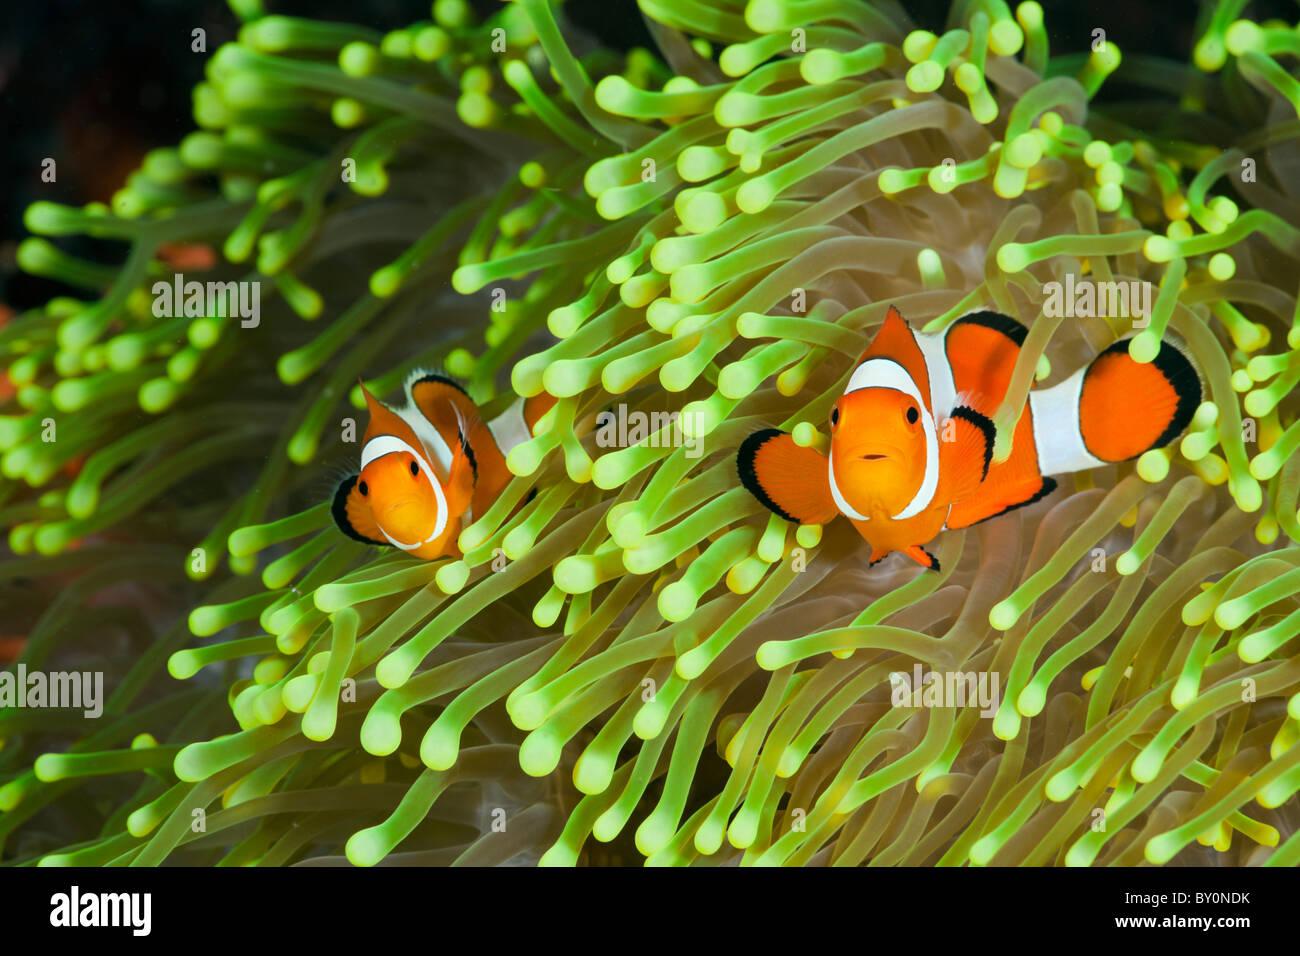 Clown Anemonefish, Amphiprion percula, Alam Batu, Bali, Indonesia Immagini Stock